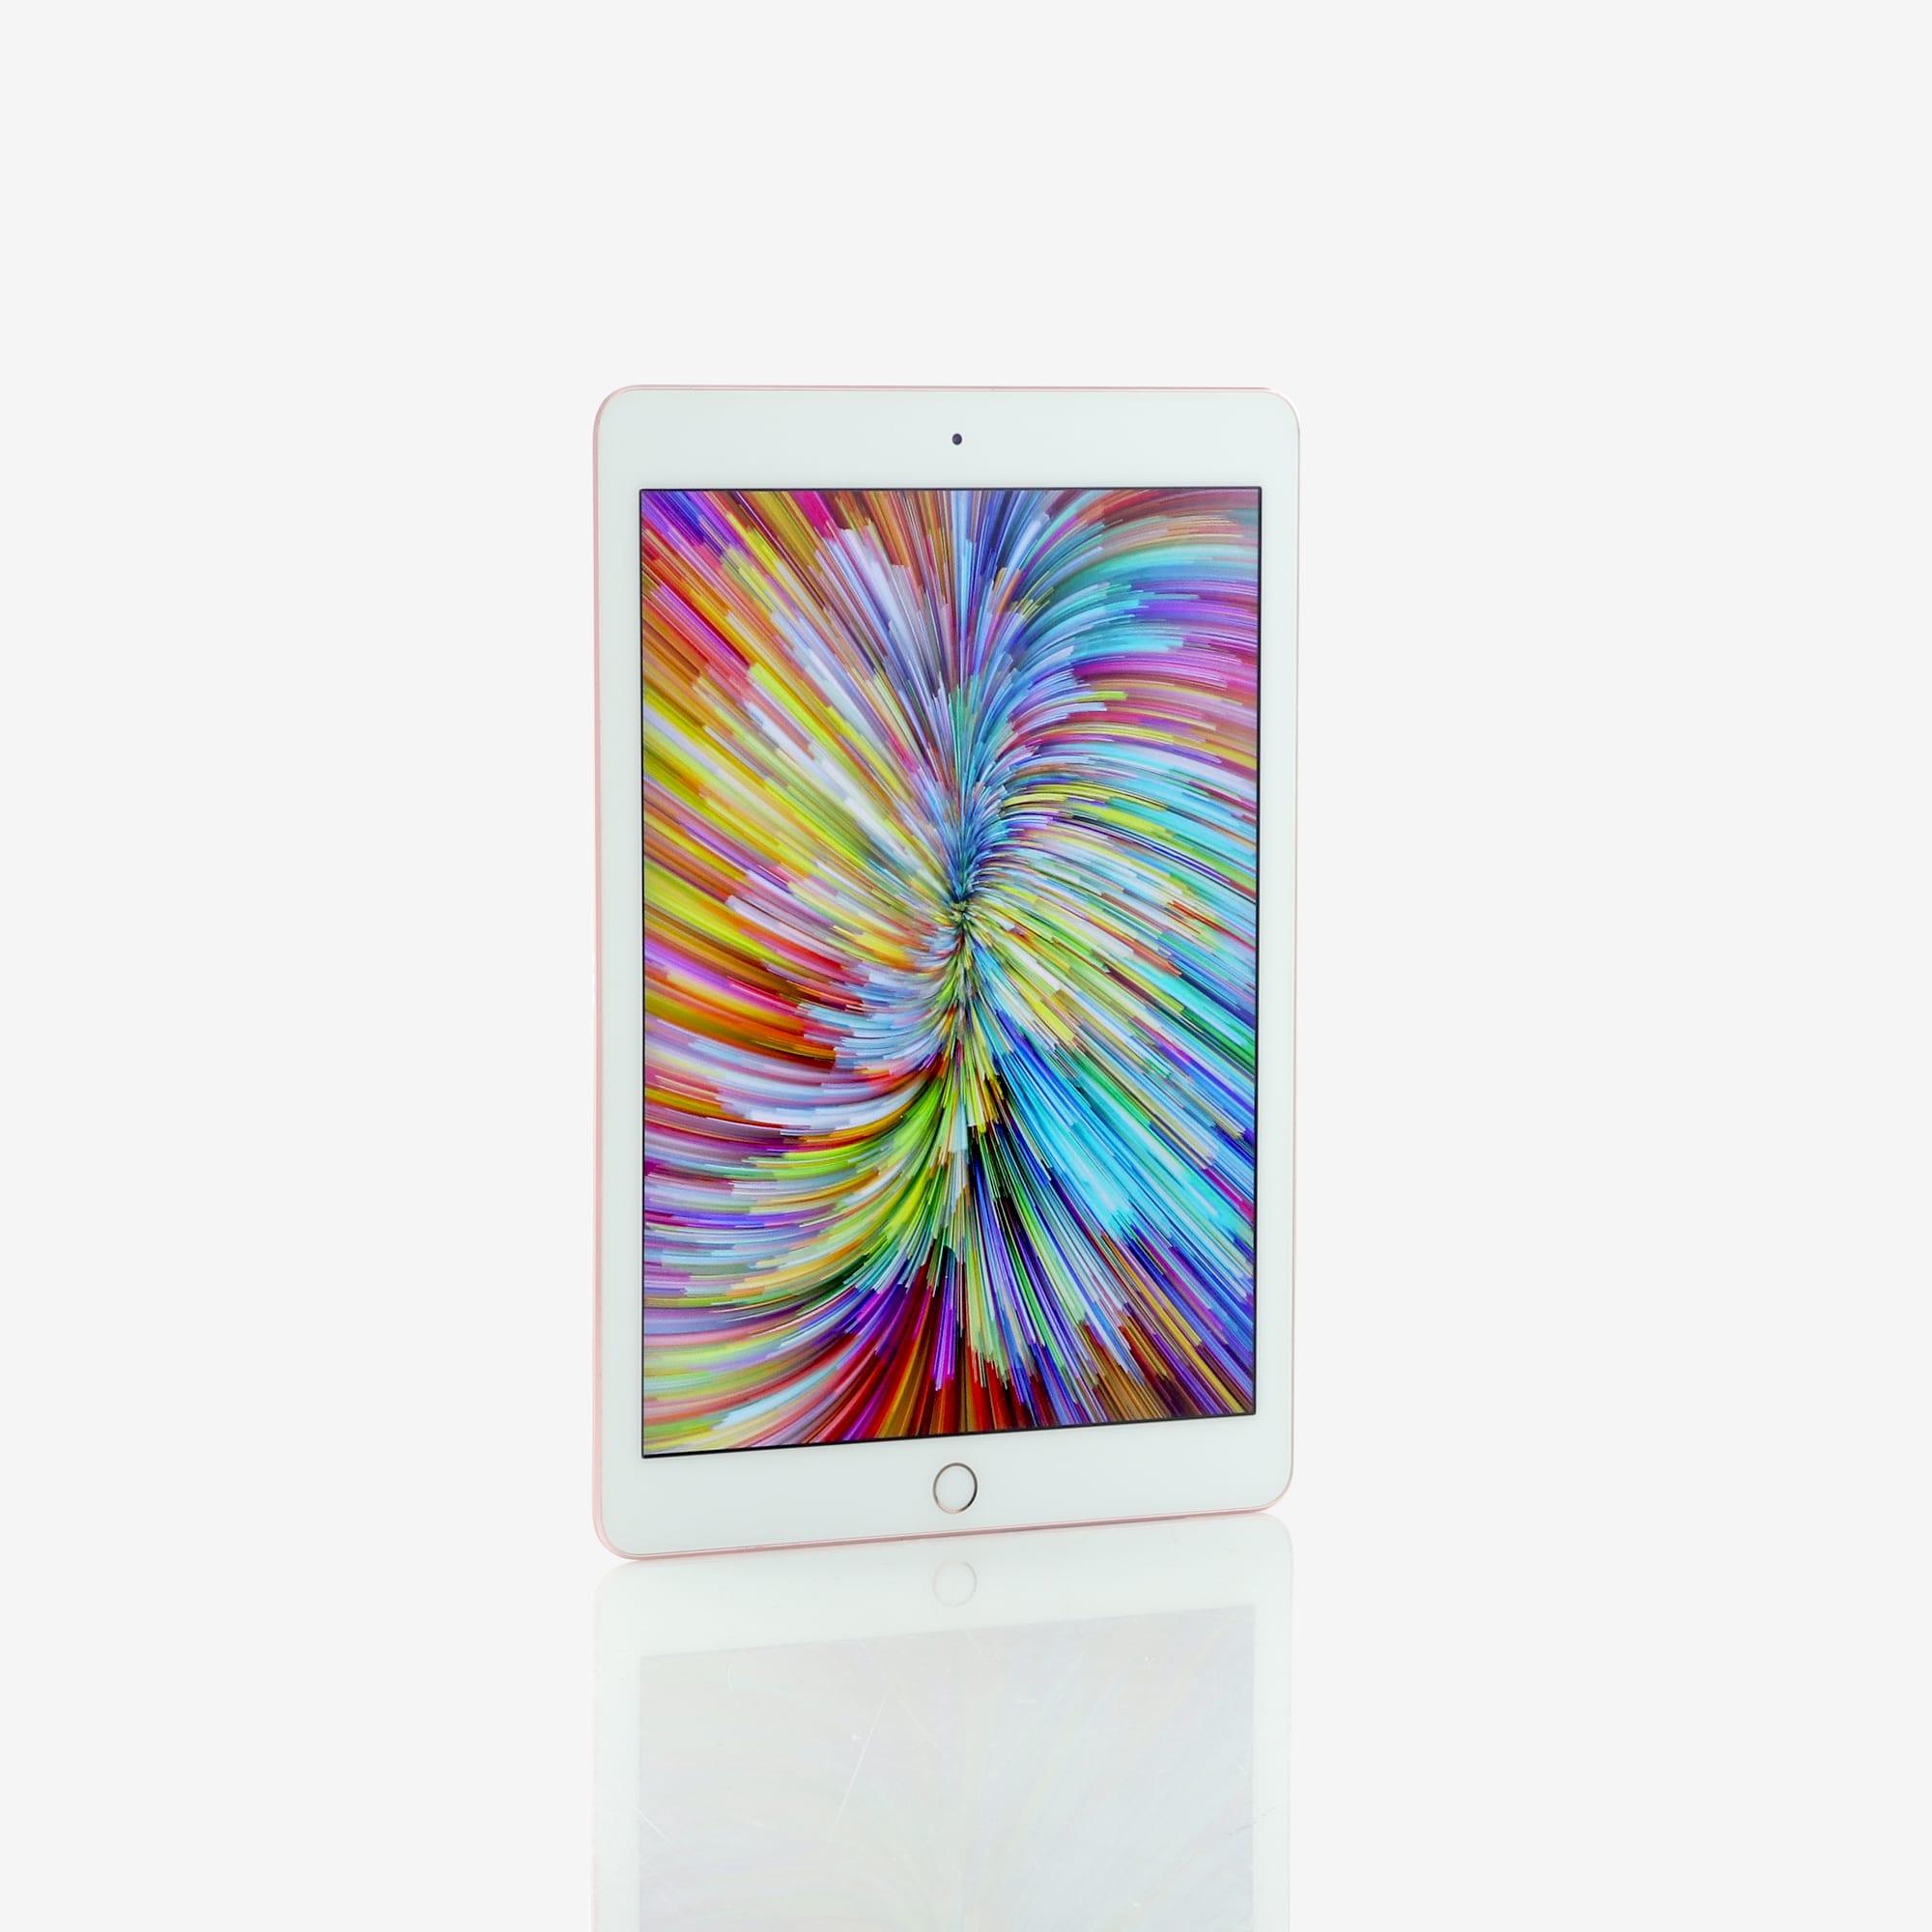 1 x iPad Pro (9.7-inch) (Wi-Fi) Rose Gold